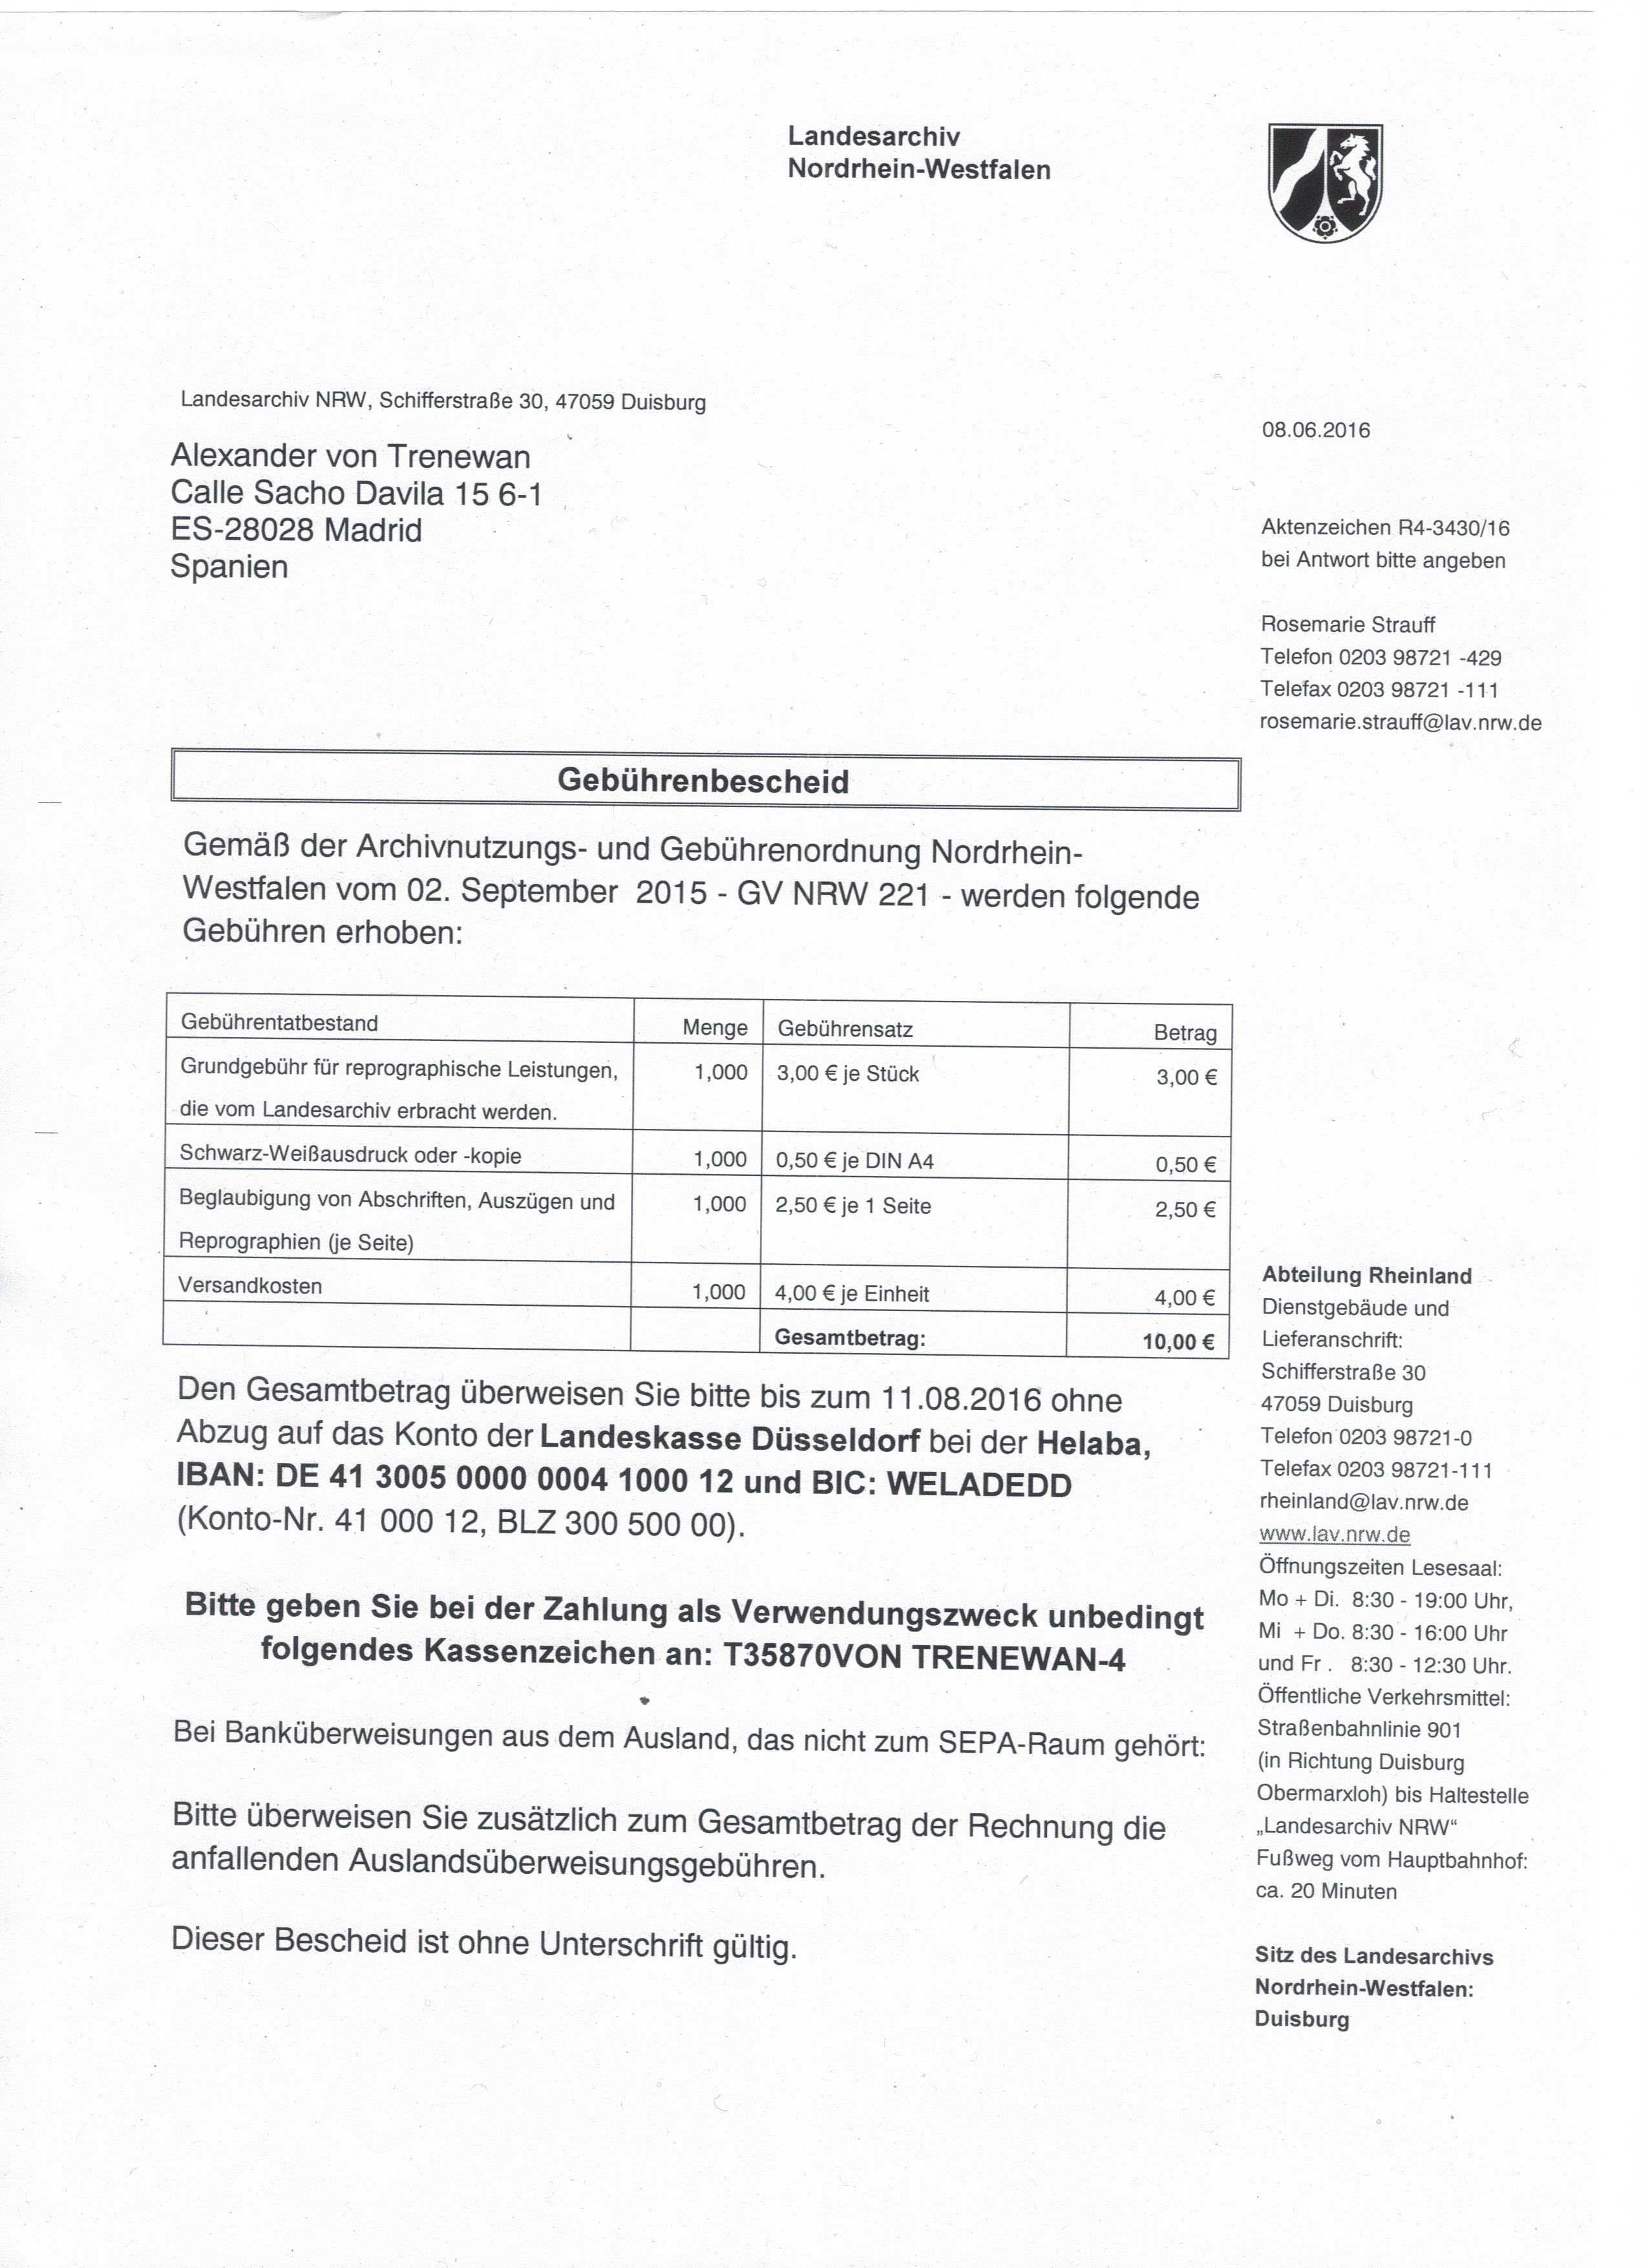 Großzügig Ahnentafeln Arbeitsblatt Ideen - Mathe Arbeitsblatt ...